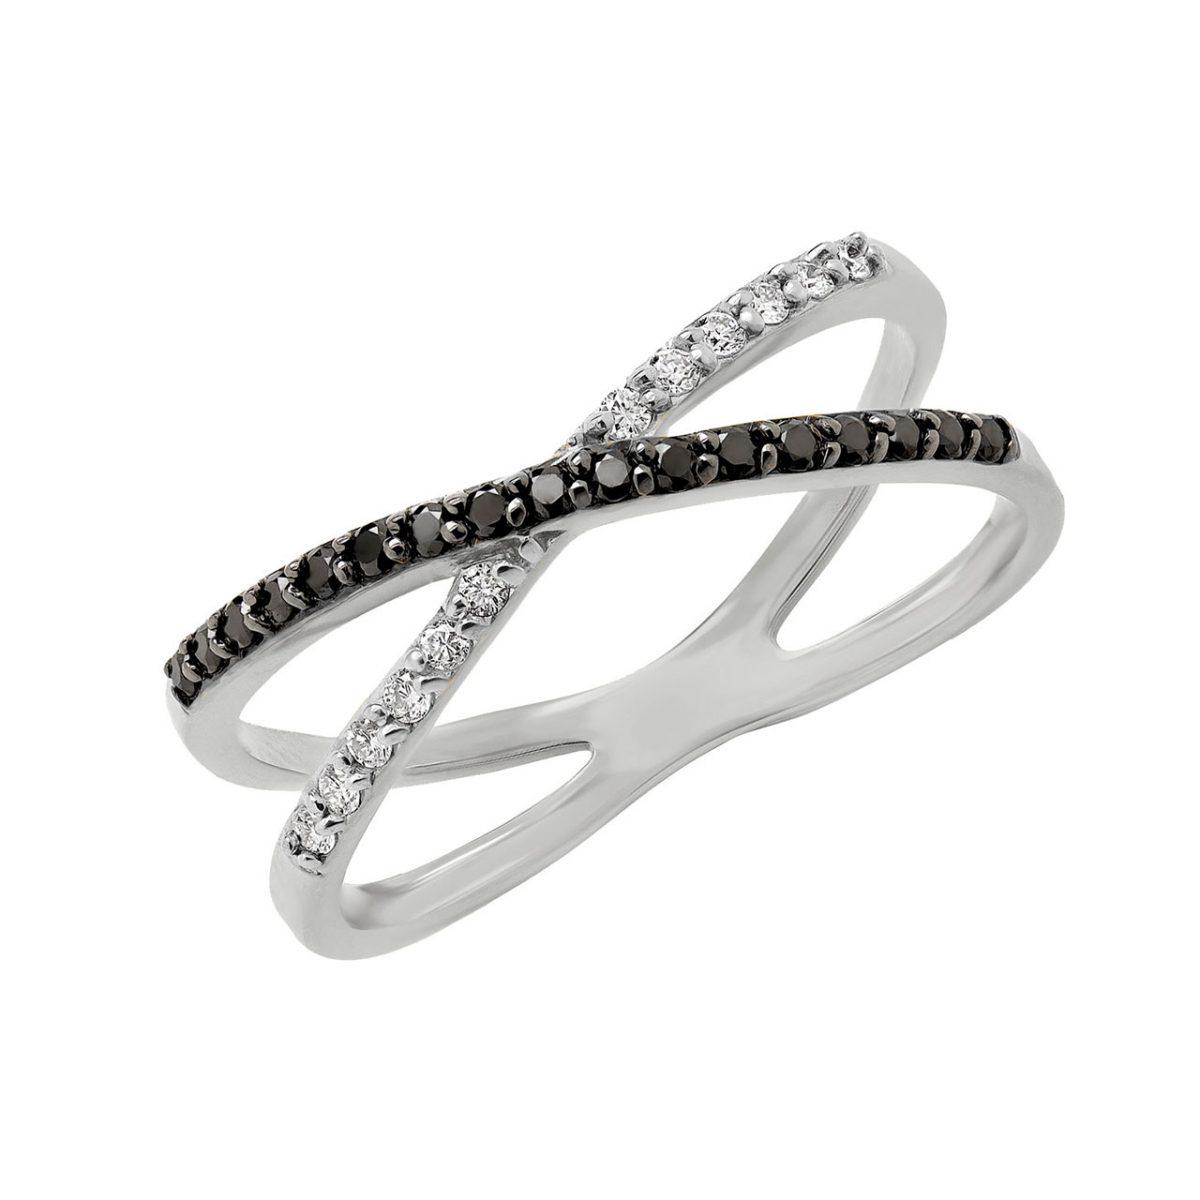 Black & white diamond cocktail ring in 10k white gold